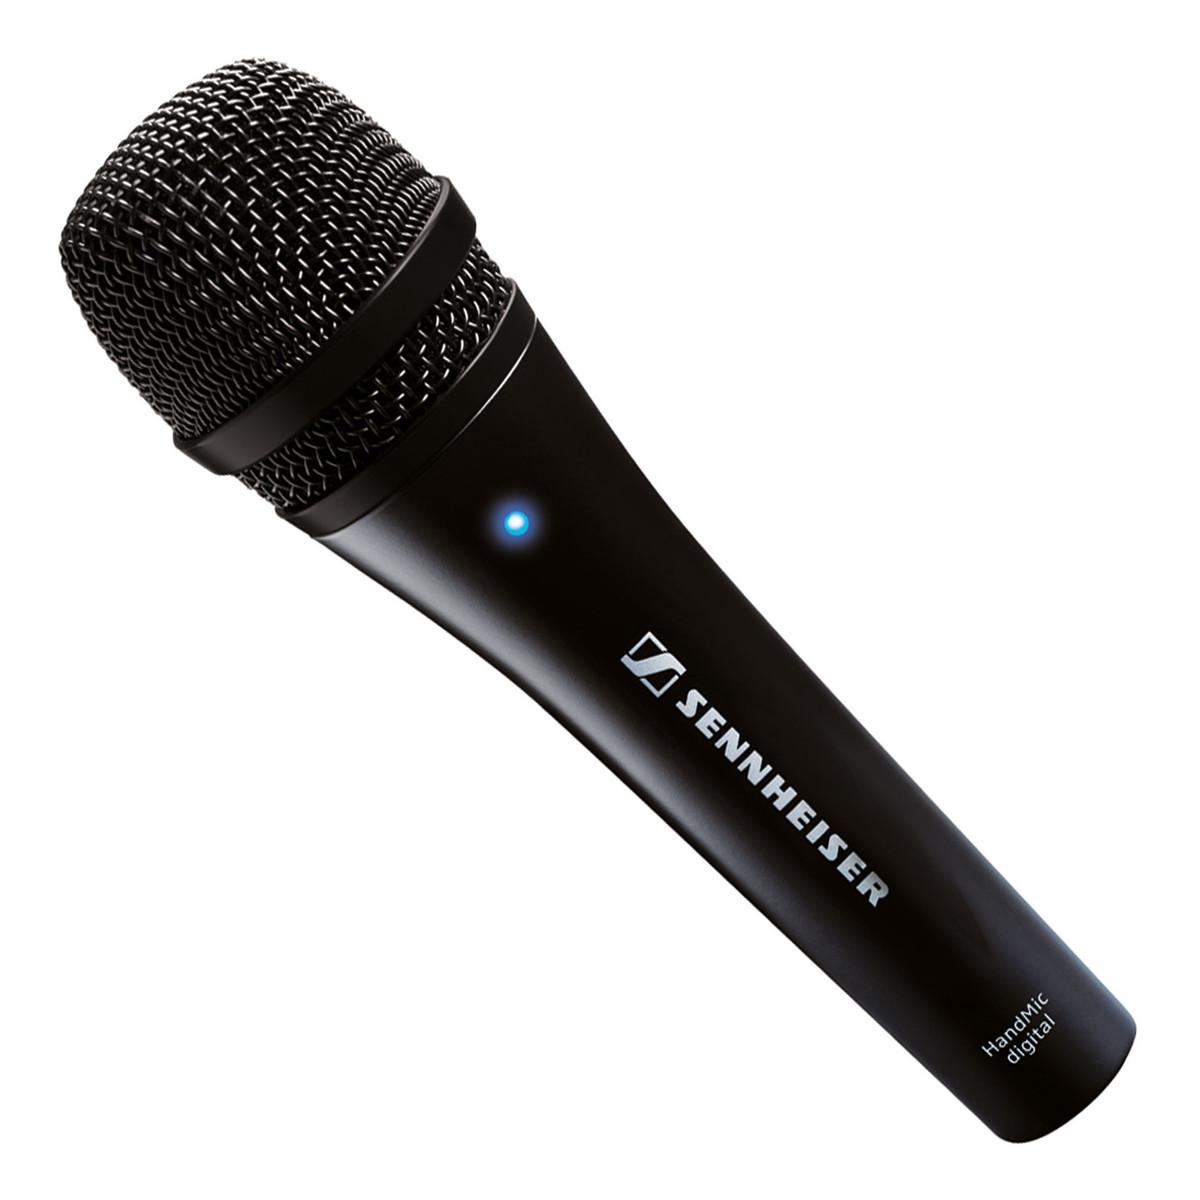 sennheiser handmic digital dynamic microphone gear4music. Black Bedroom Furniture Sets. Home Design Ideas